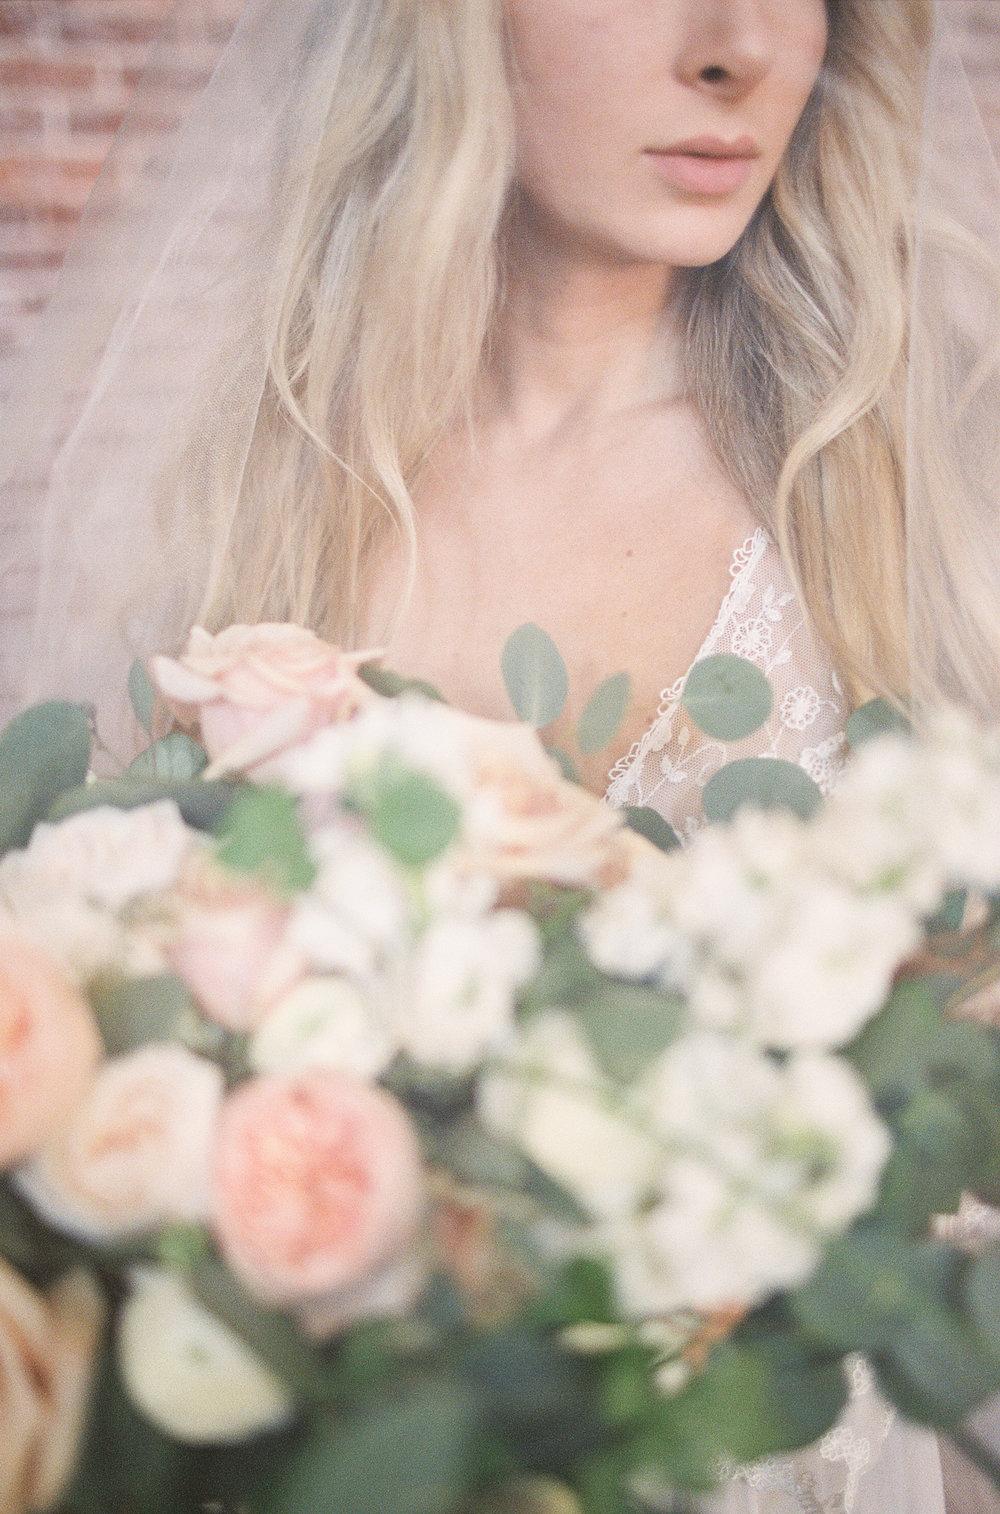 JulietYoung_FineArtWeddingPhotographer_CHW100916-40.jpg